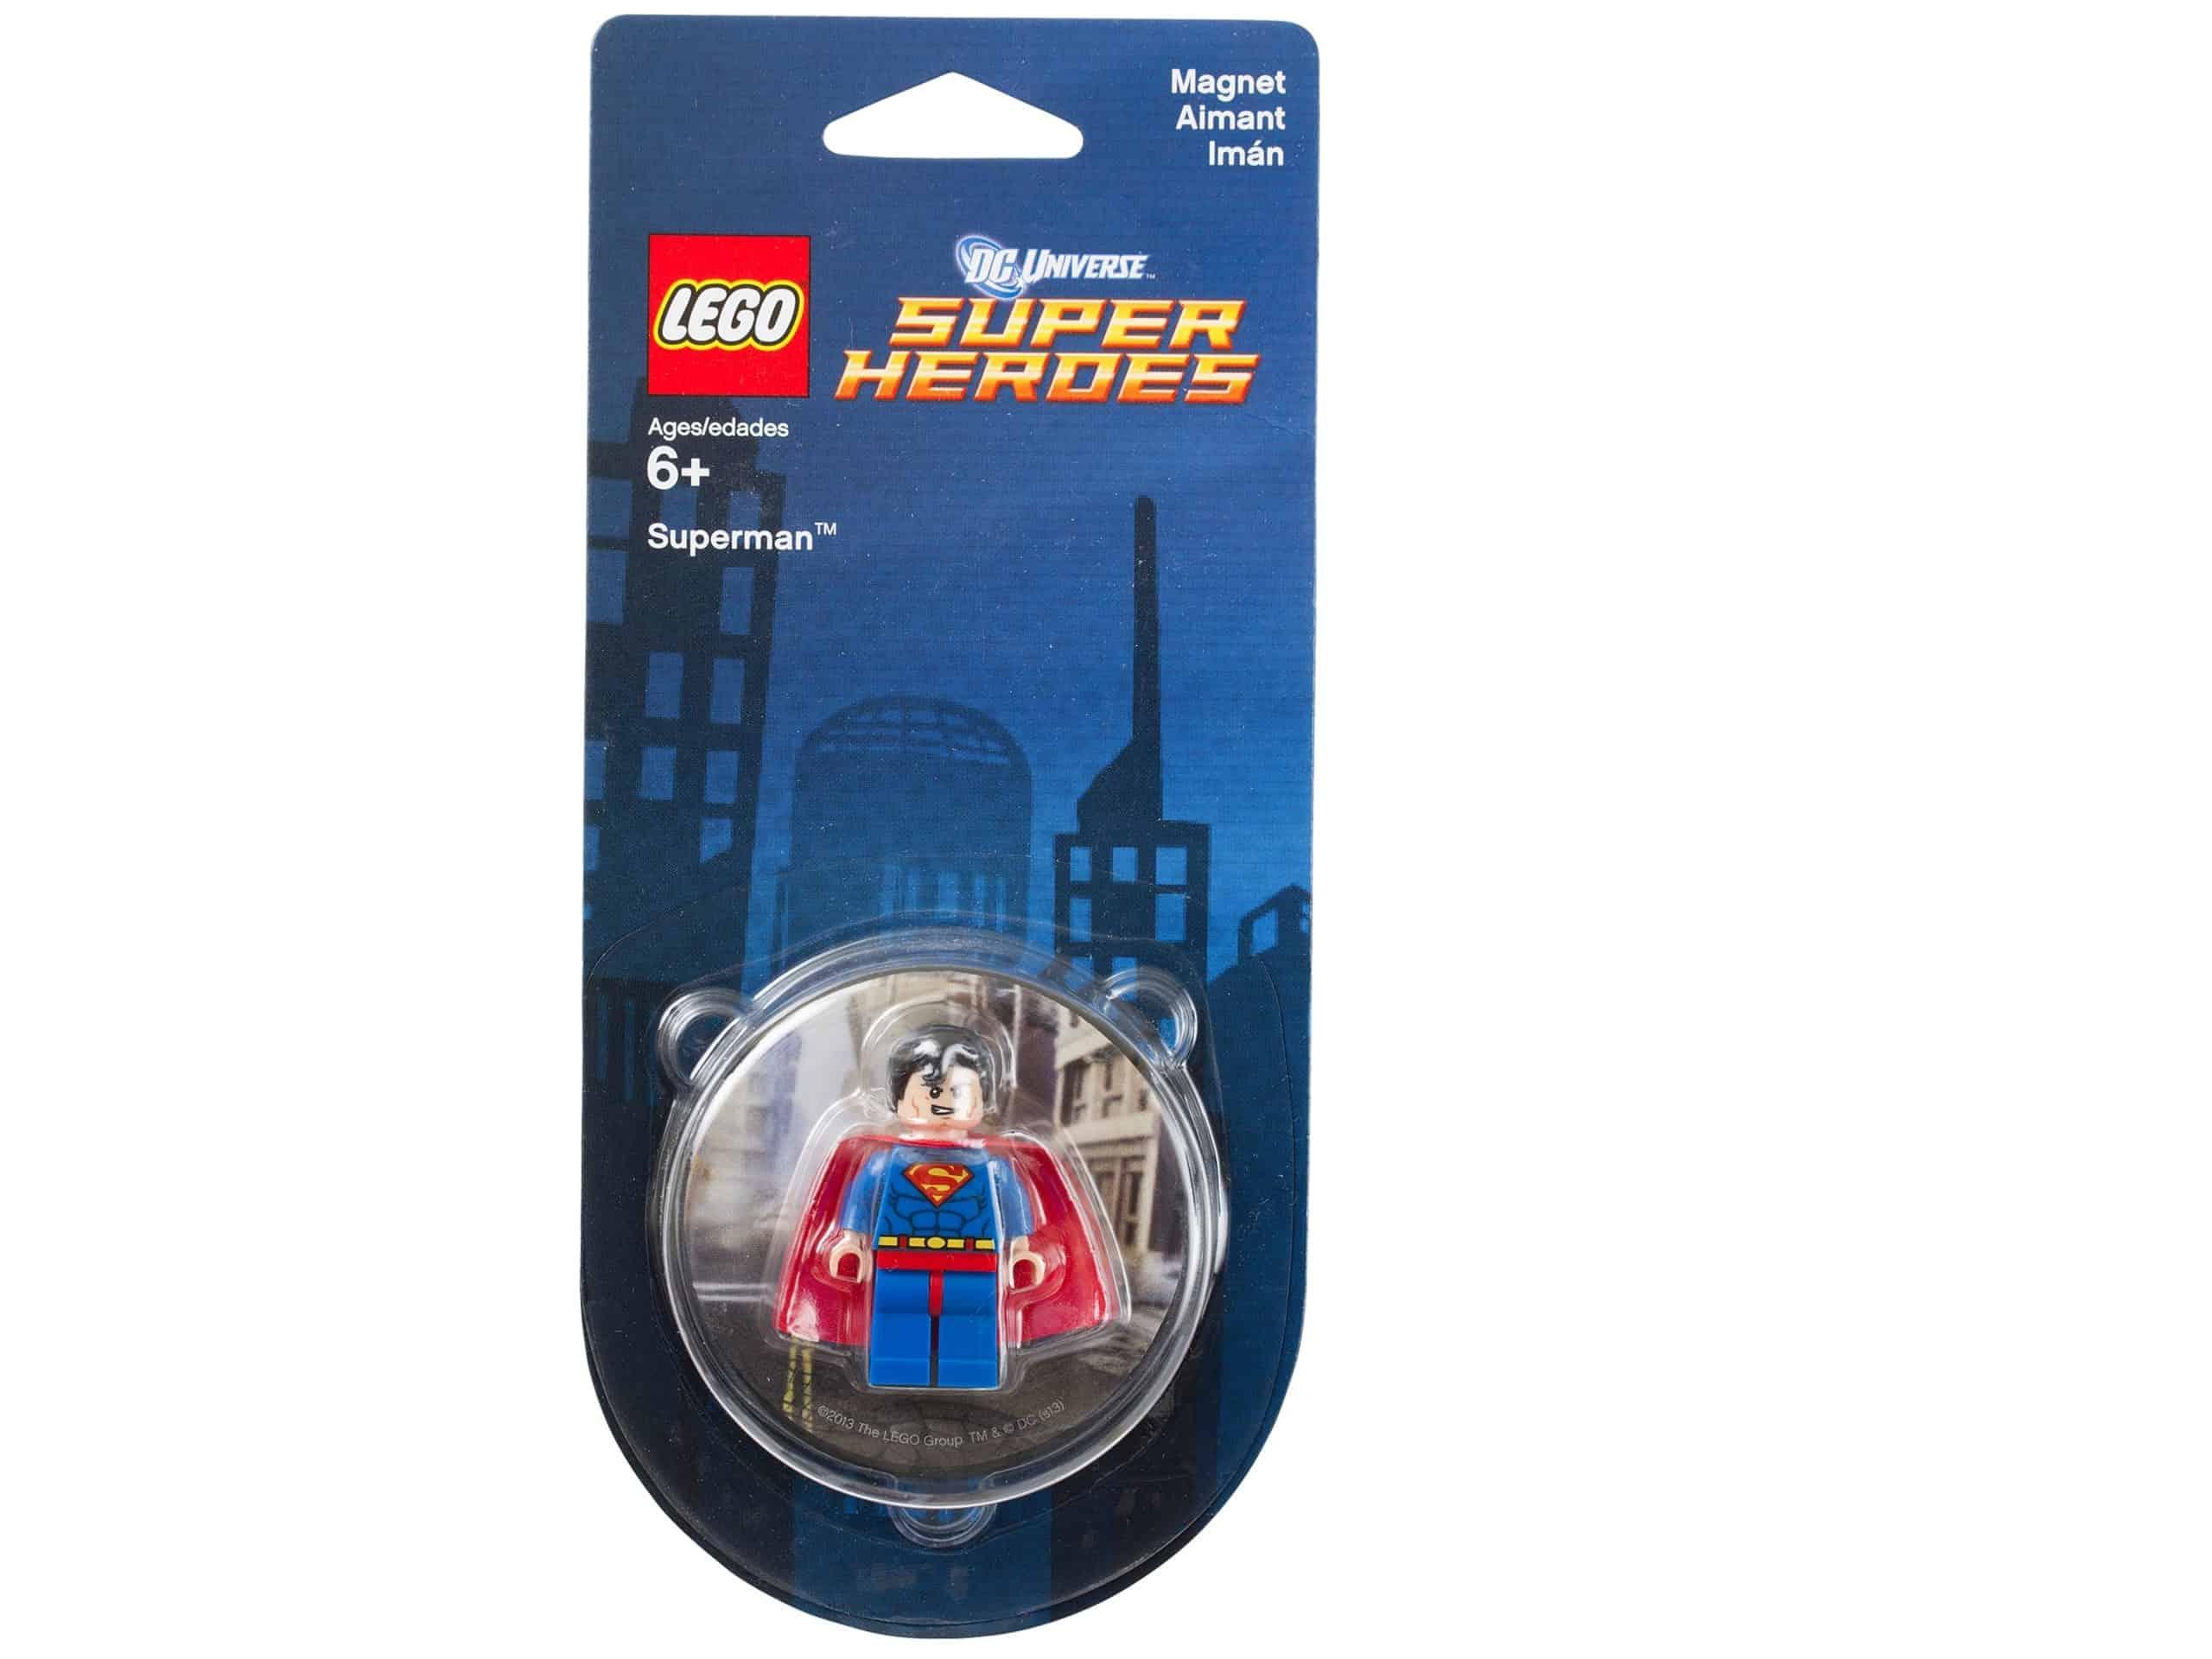 850670 official lego 850670 shop se scaled